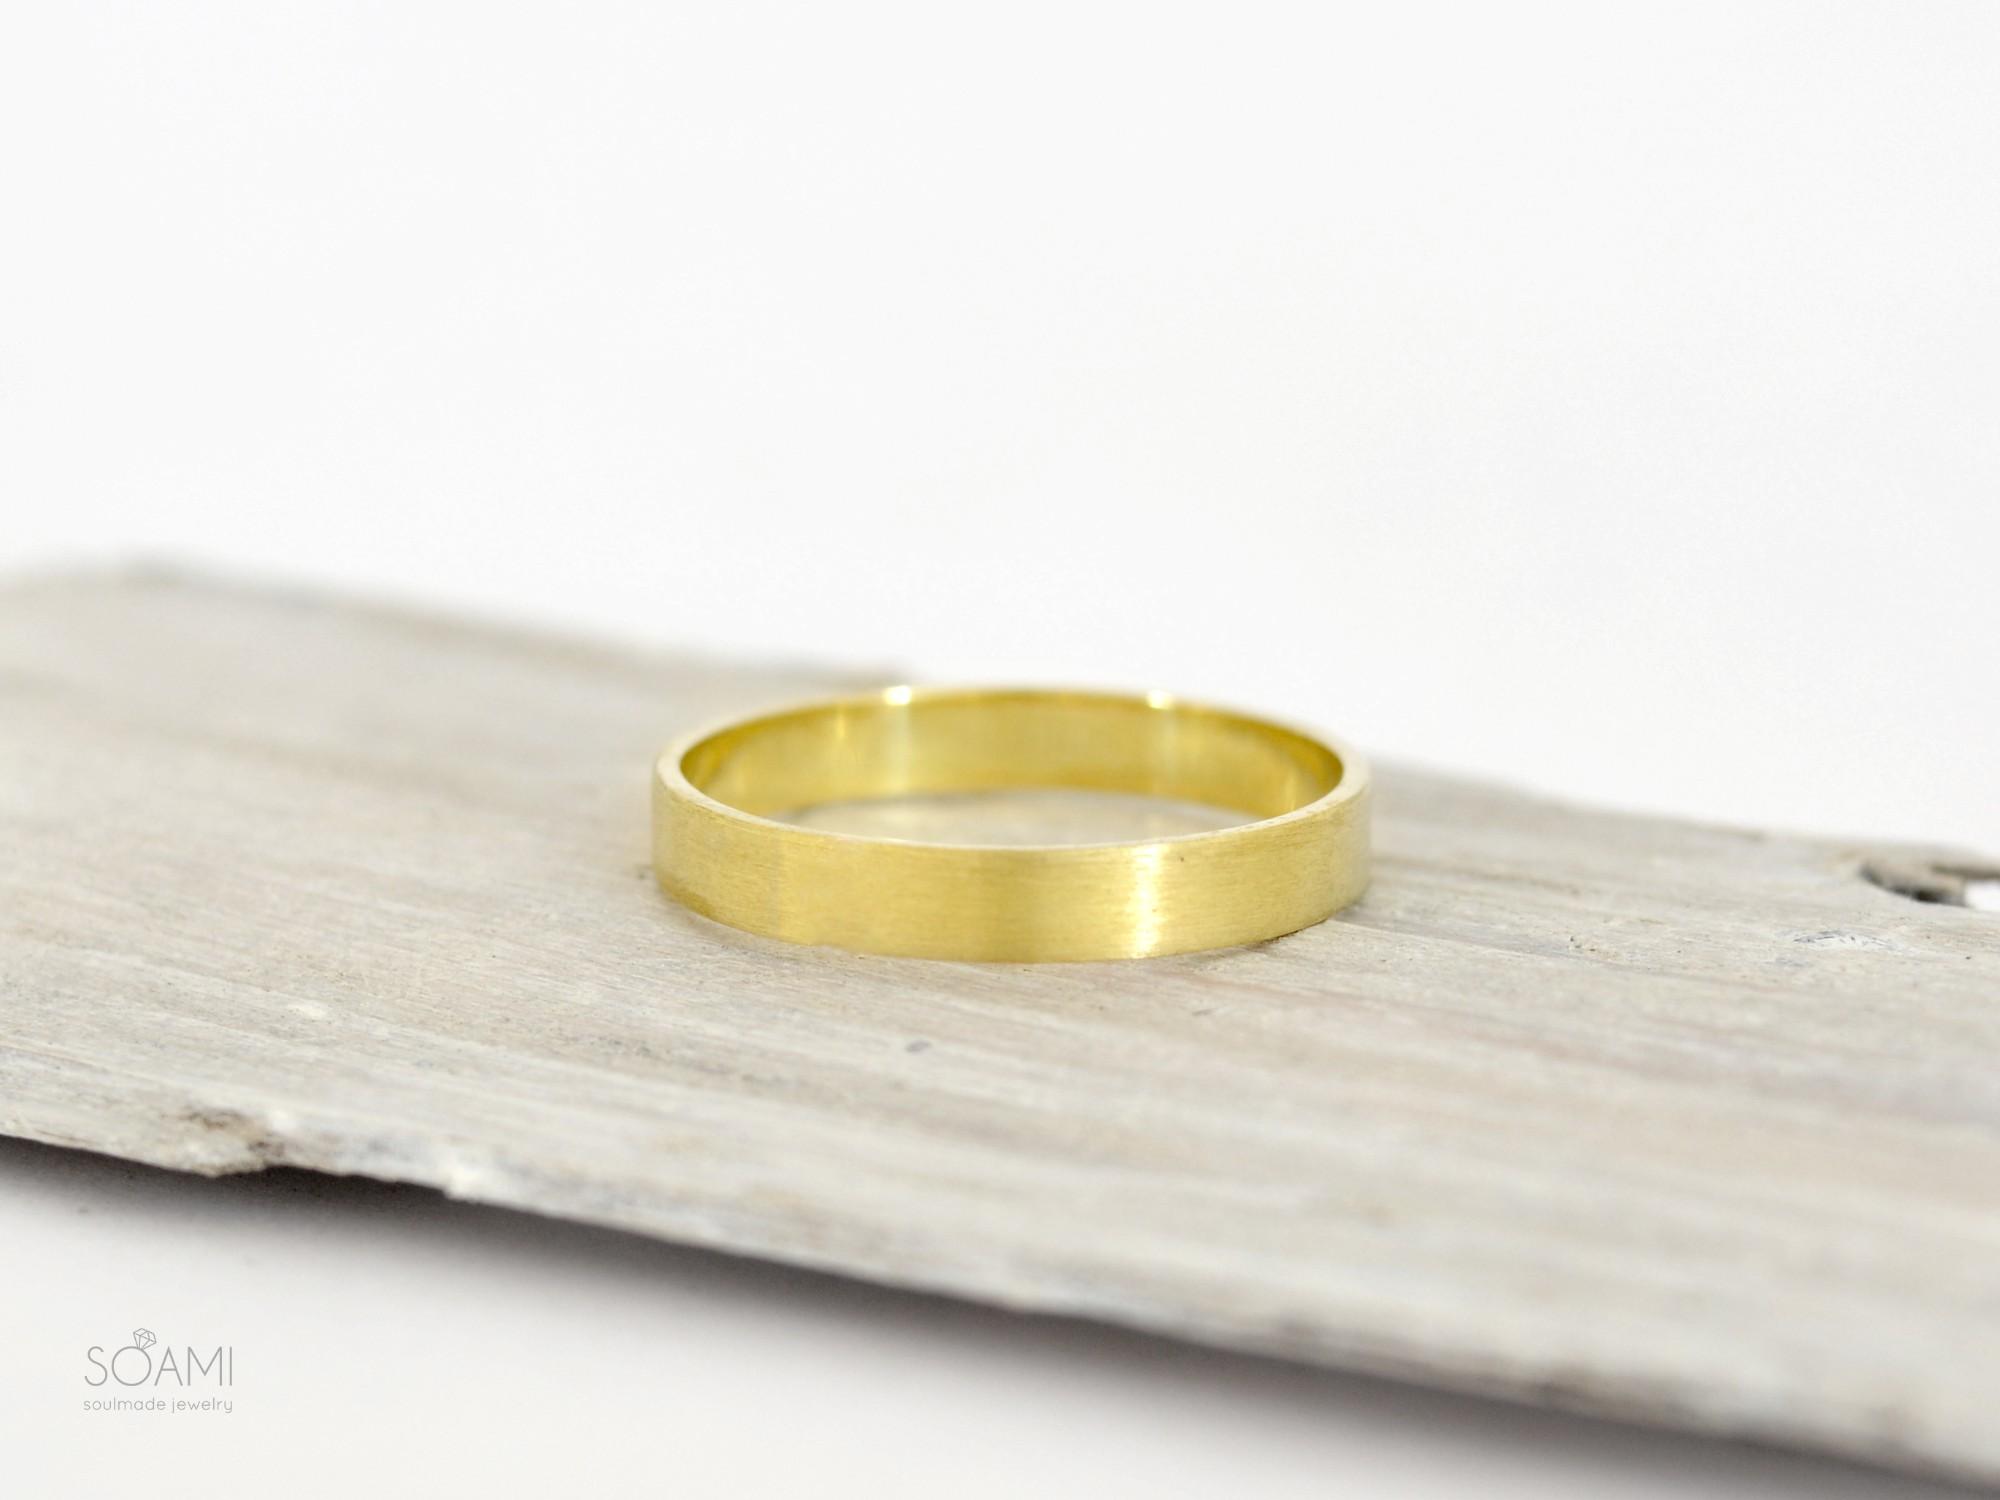 585 zlatý matný prsten